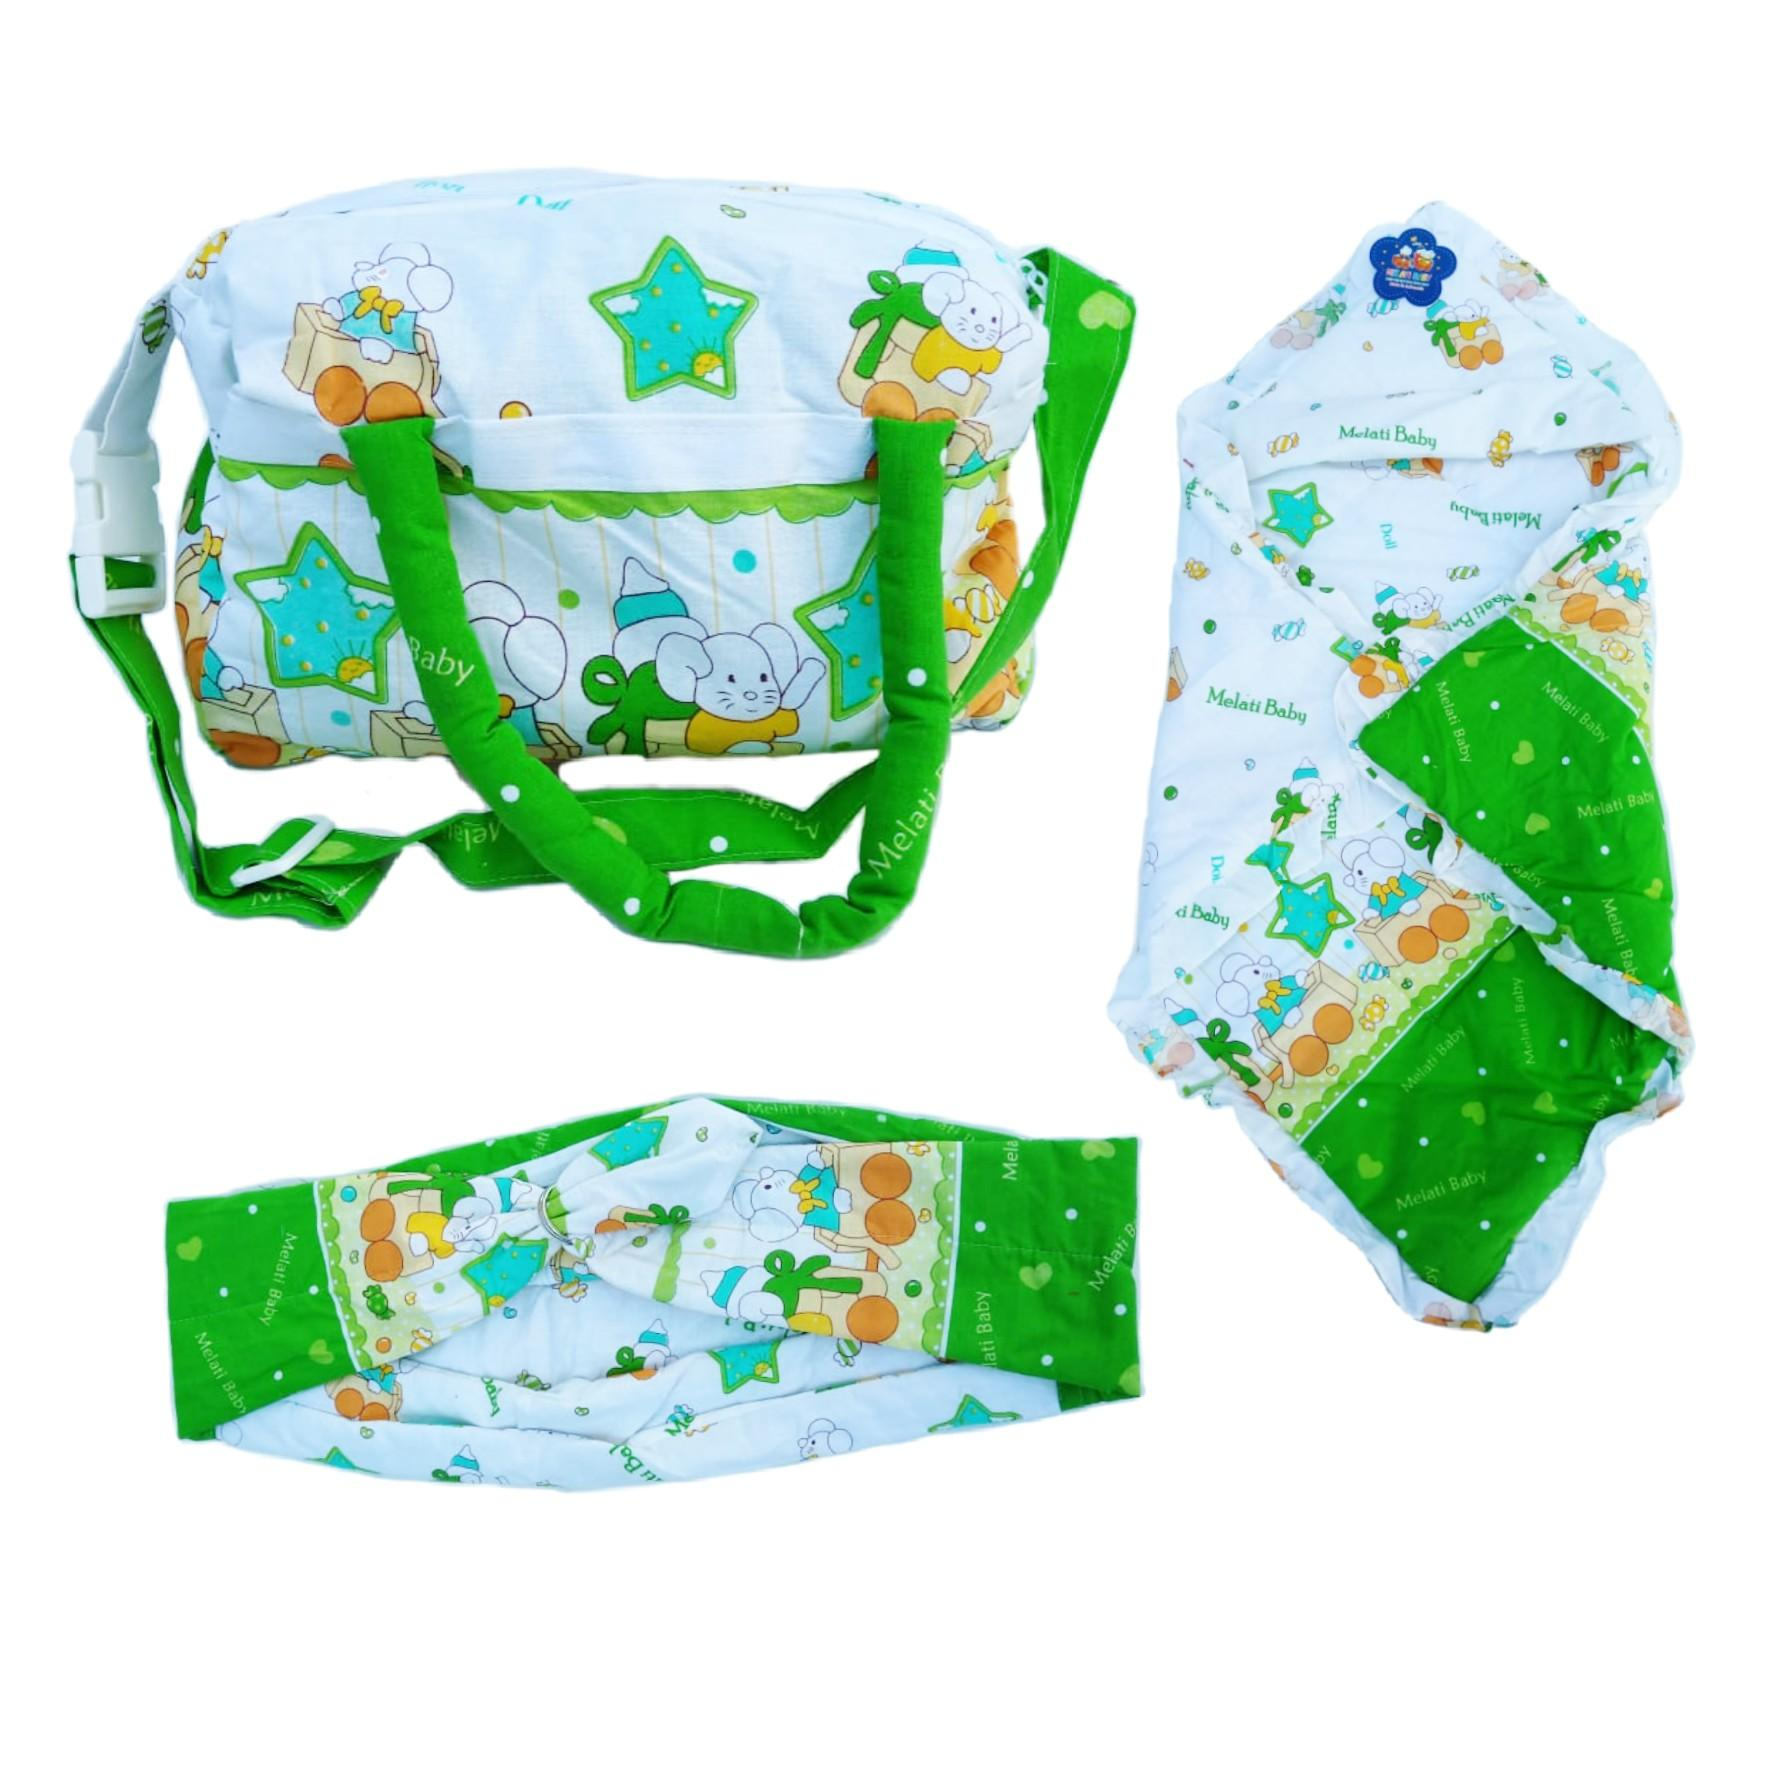 Perlengkapan Bayi Set Tas,selimut Dan Gendongan 02 By Alby Fashiont.